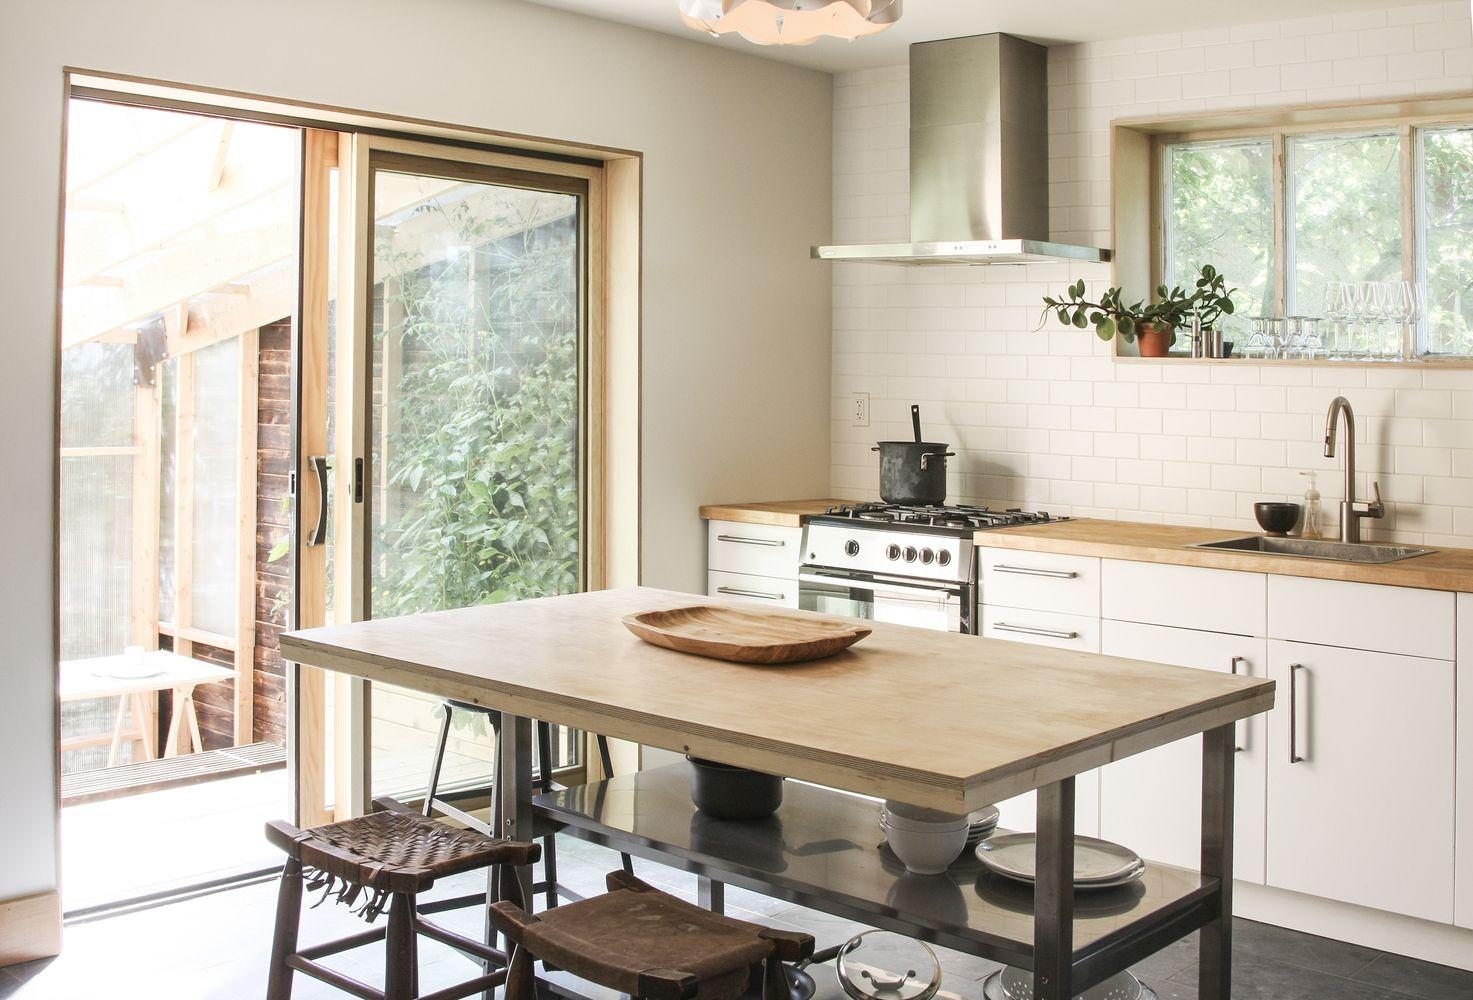 Gallery of Homeaway / Studio North 4 Kitchen